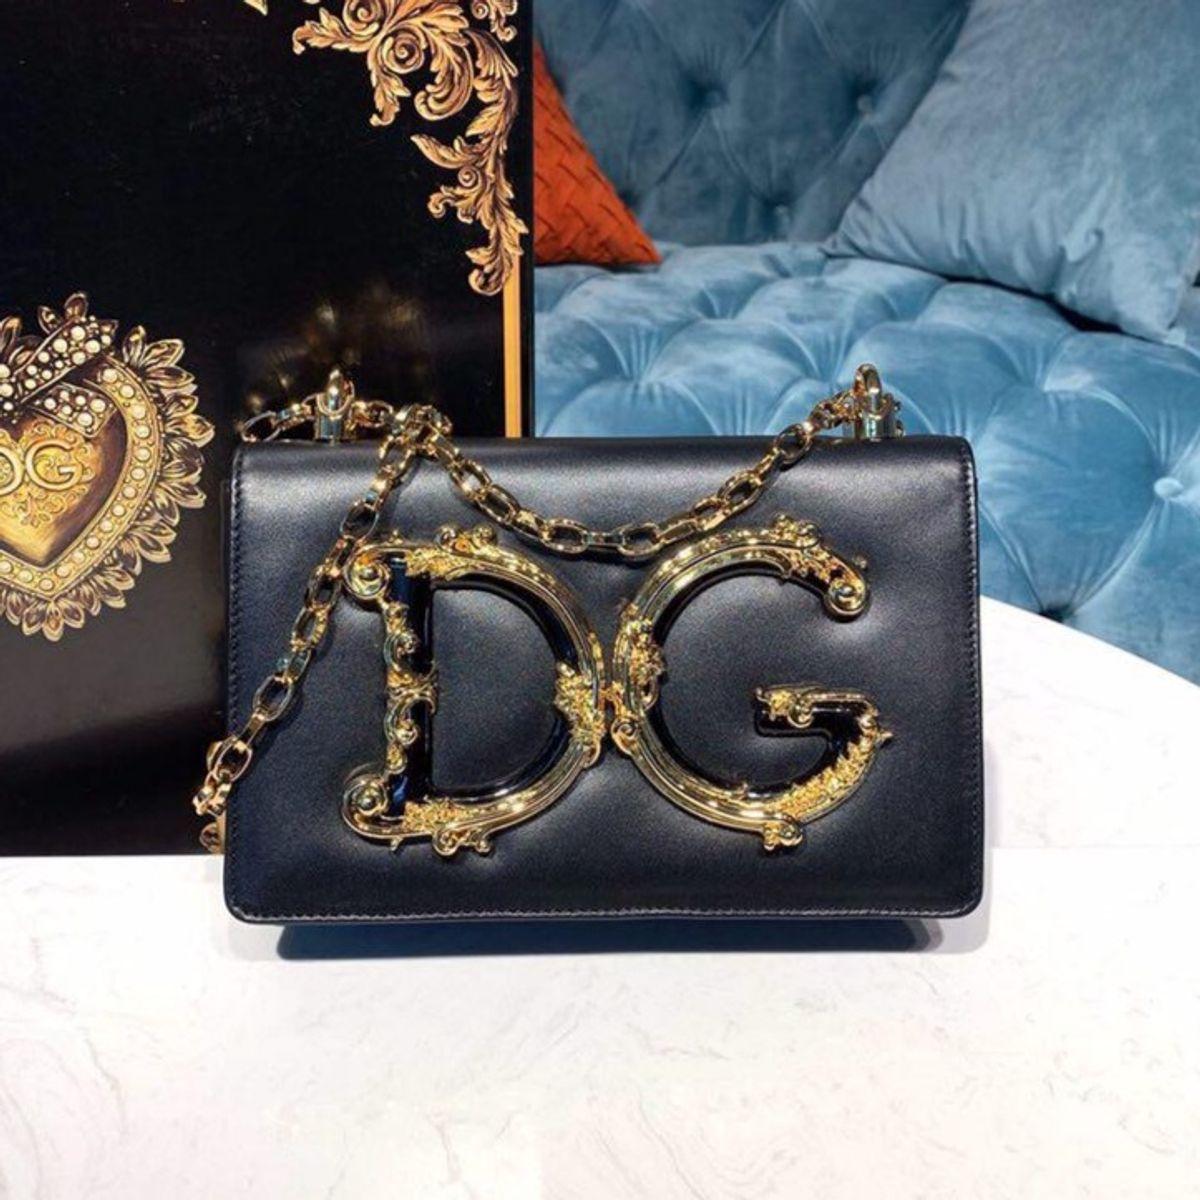 Bolsa DG Girl - Dolce & Gabbana